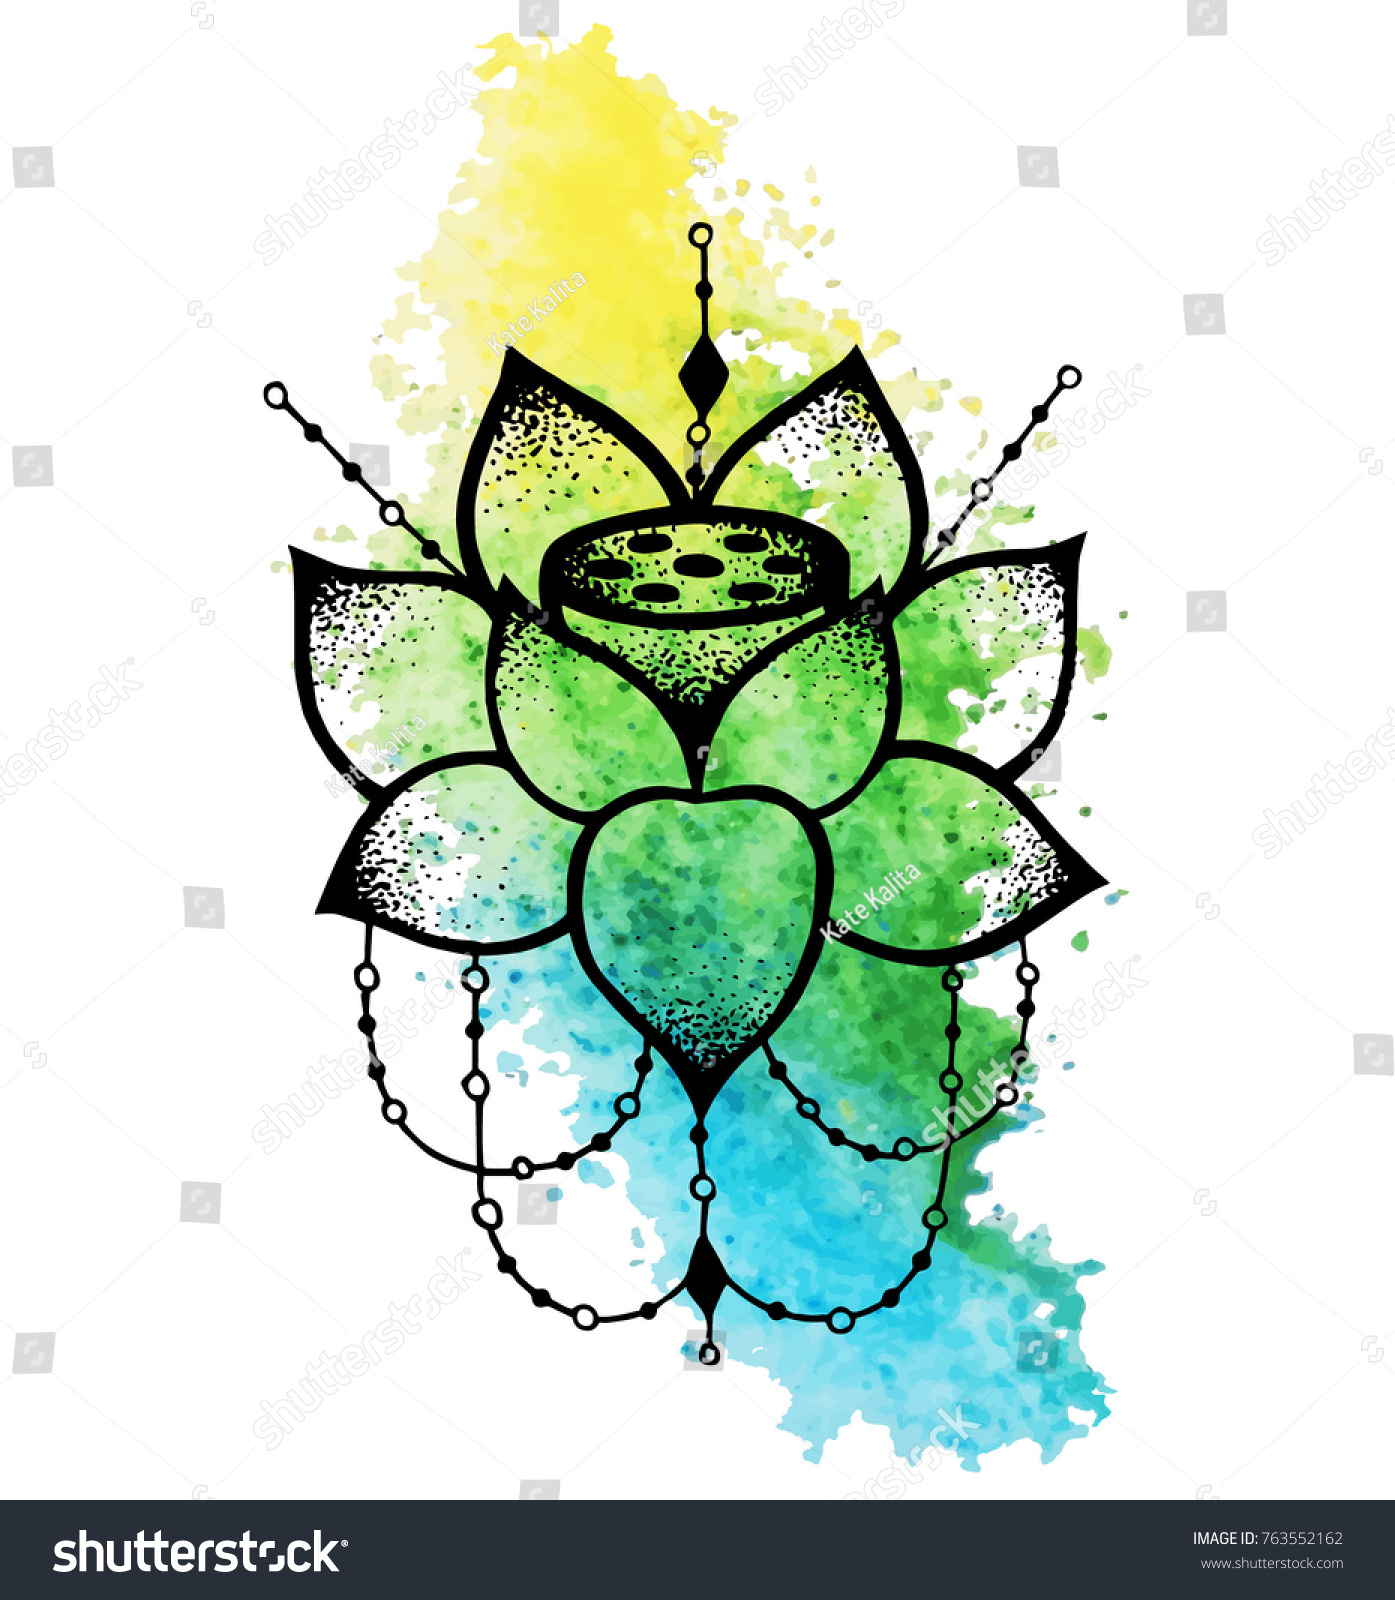 Blackwork tattoo flash lotus flower string stock vector royalty blackwork tattoo flash lotus flower with string of beads henna tattoo mystic symbol izmirmasajfo